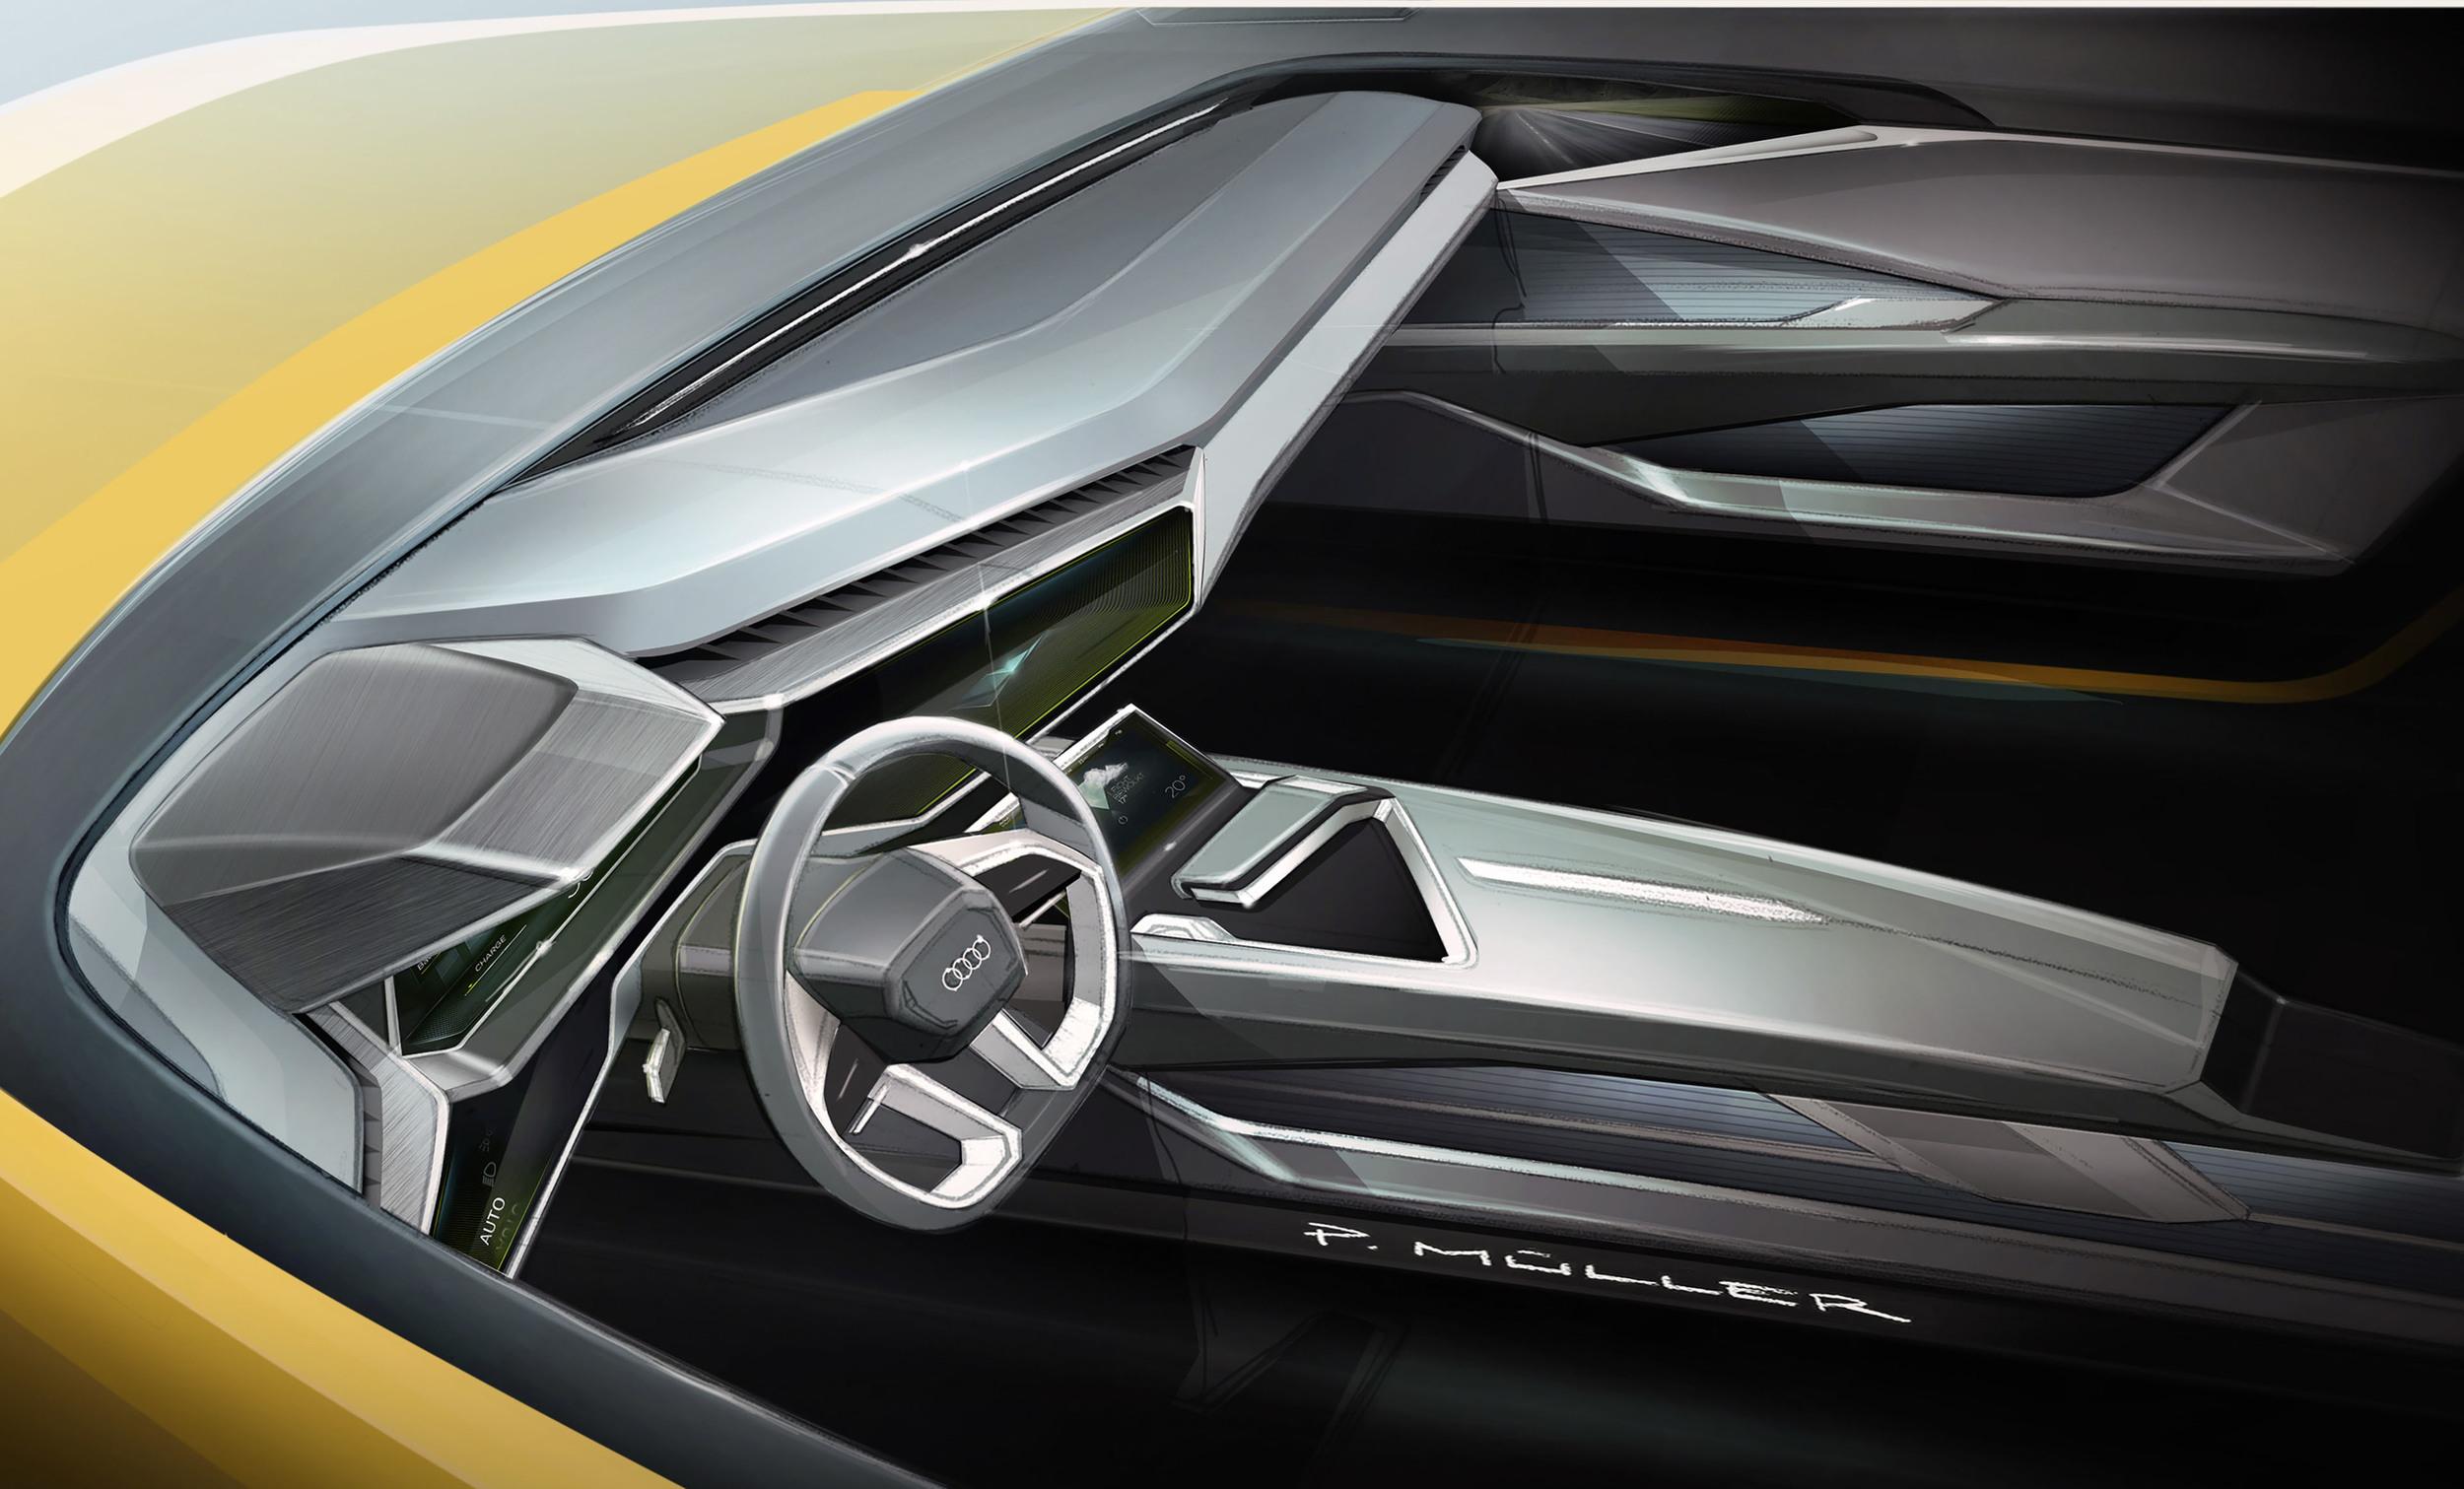 2016 Audi H Tron Quattro Concepts